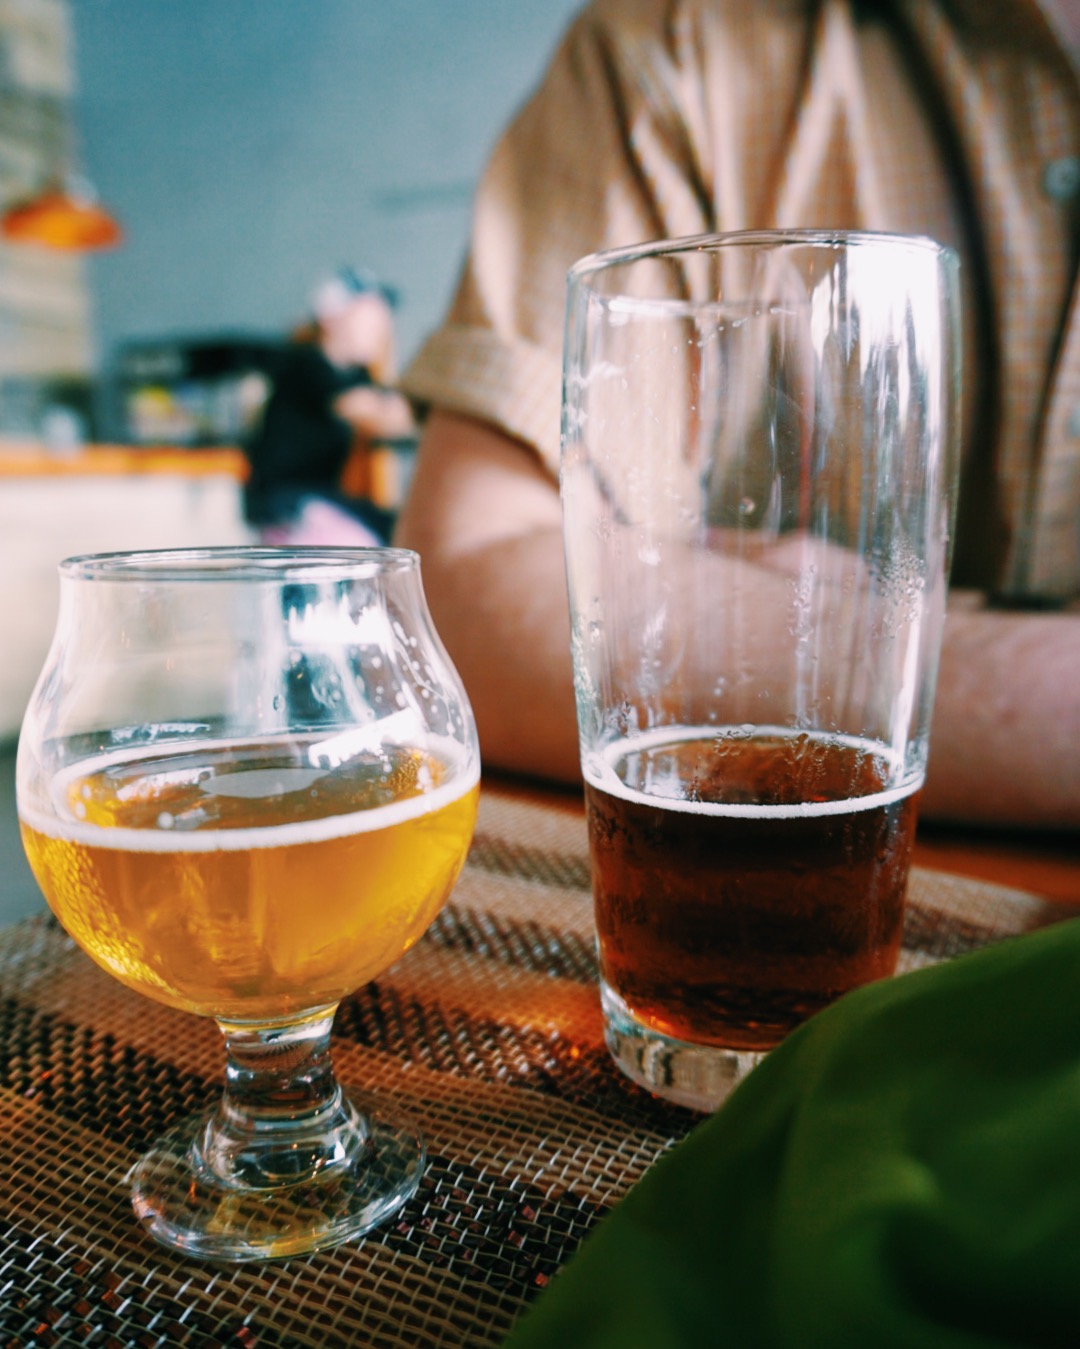 Creature Comforts craft beer in Athens, GA